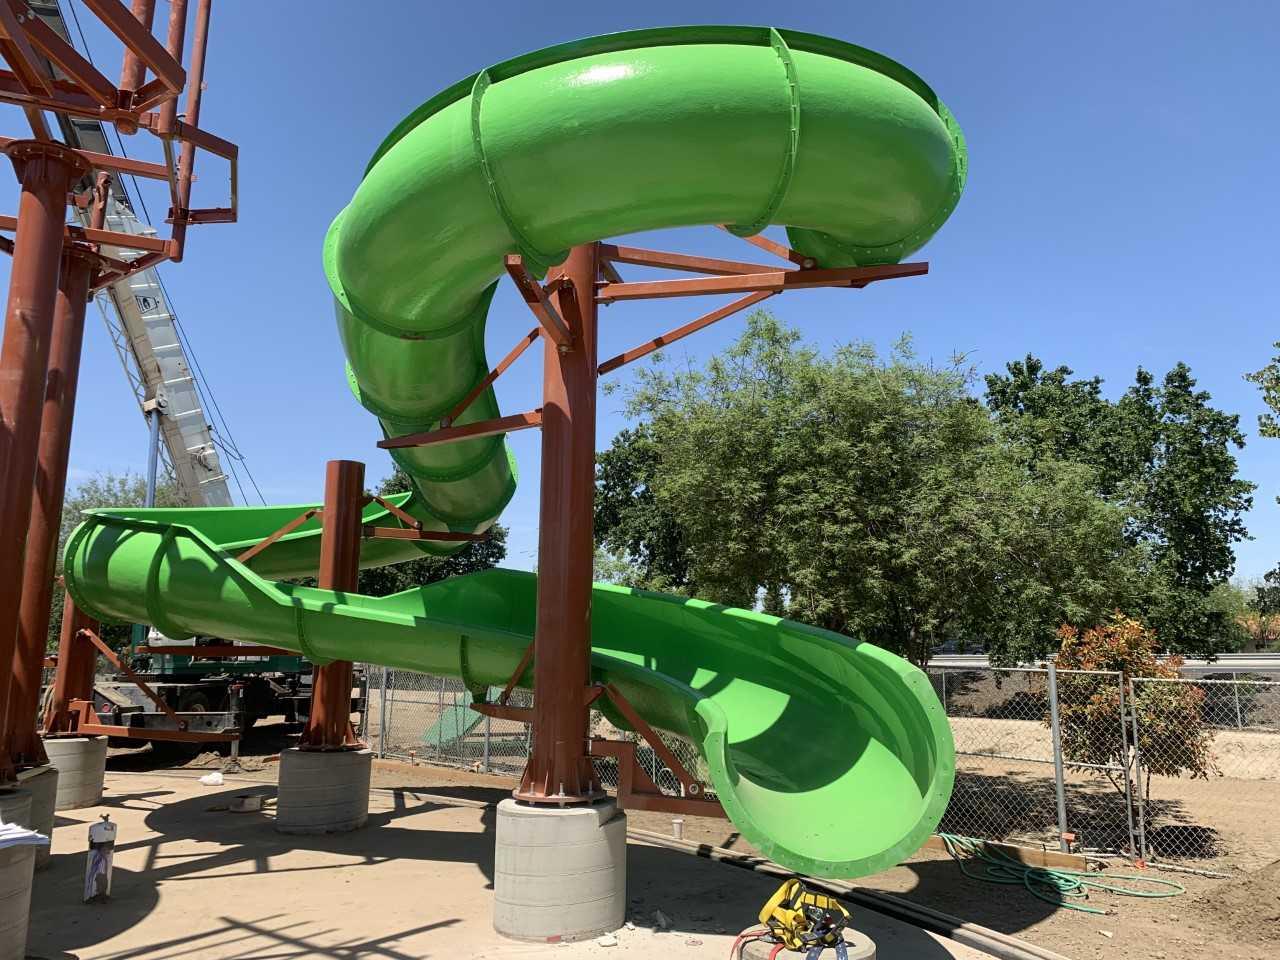 Water Slide Visalia